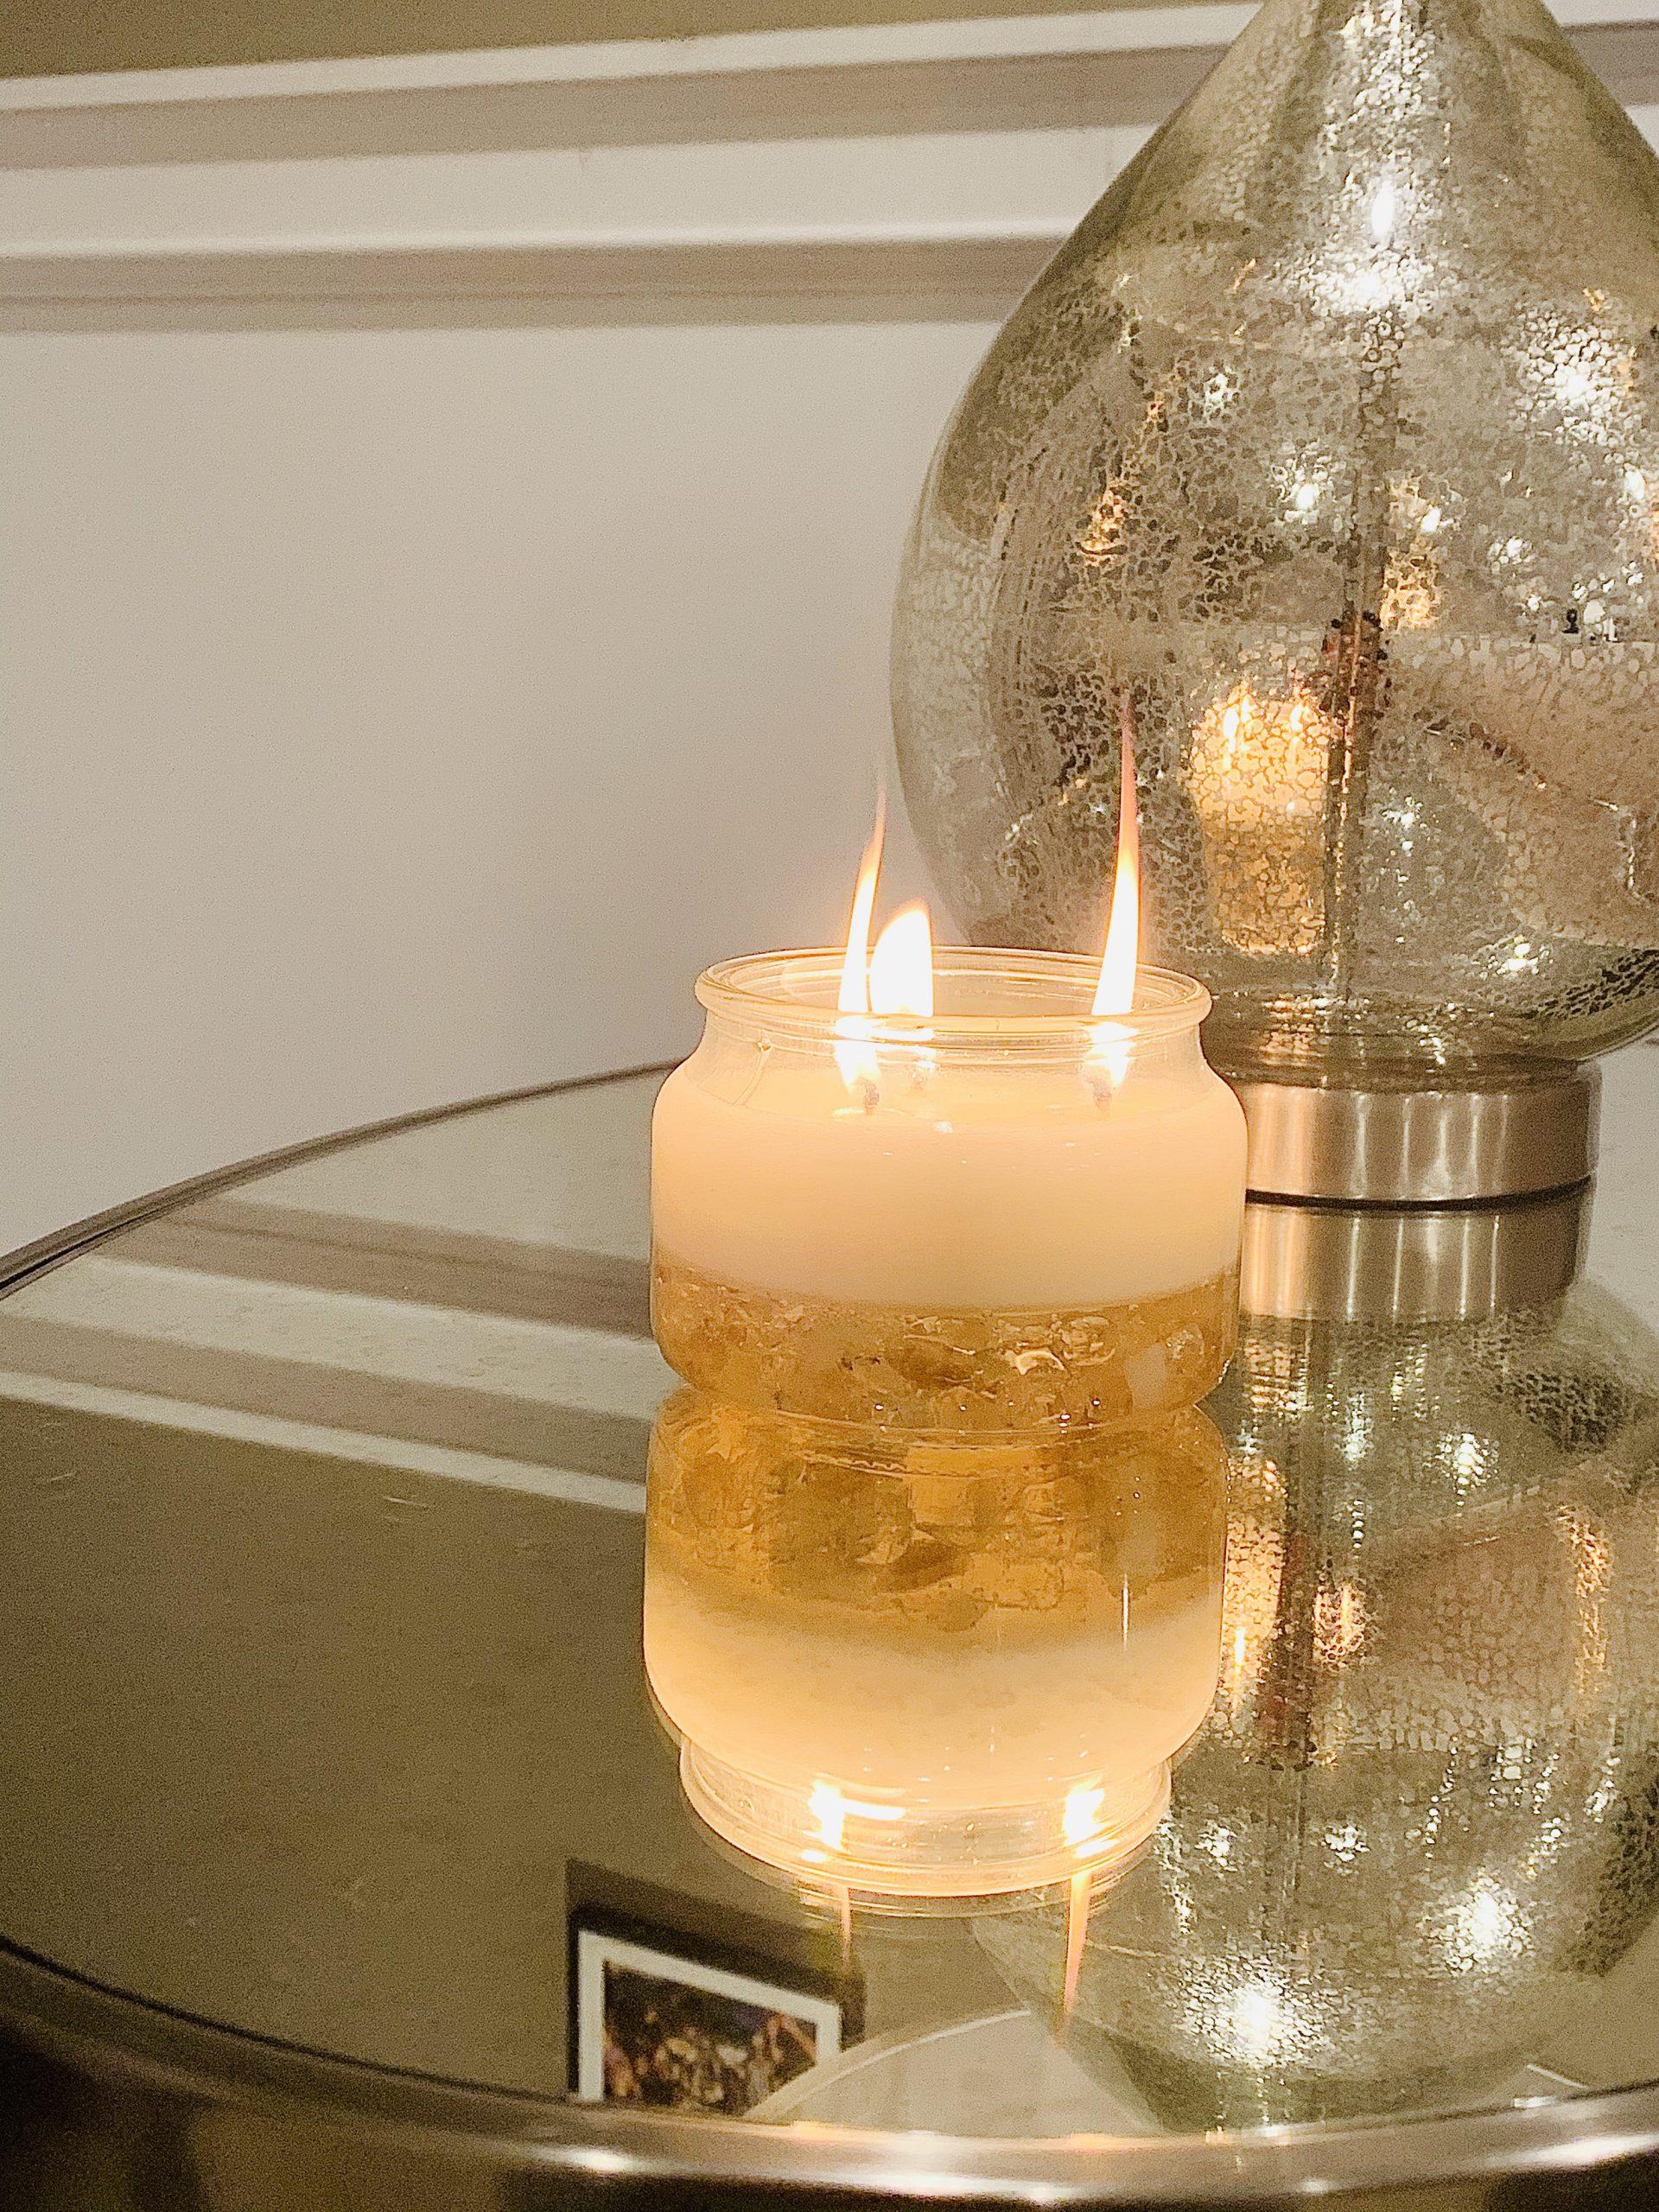 Healing Crystal Candles